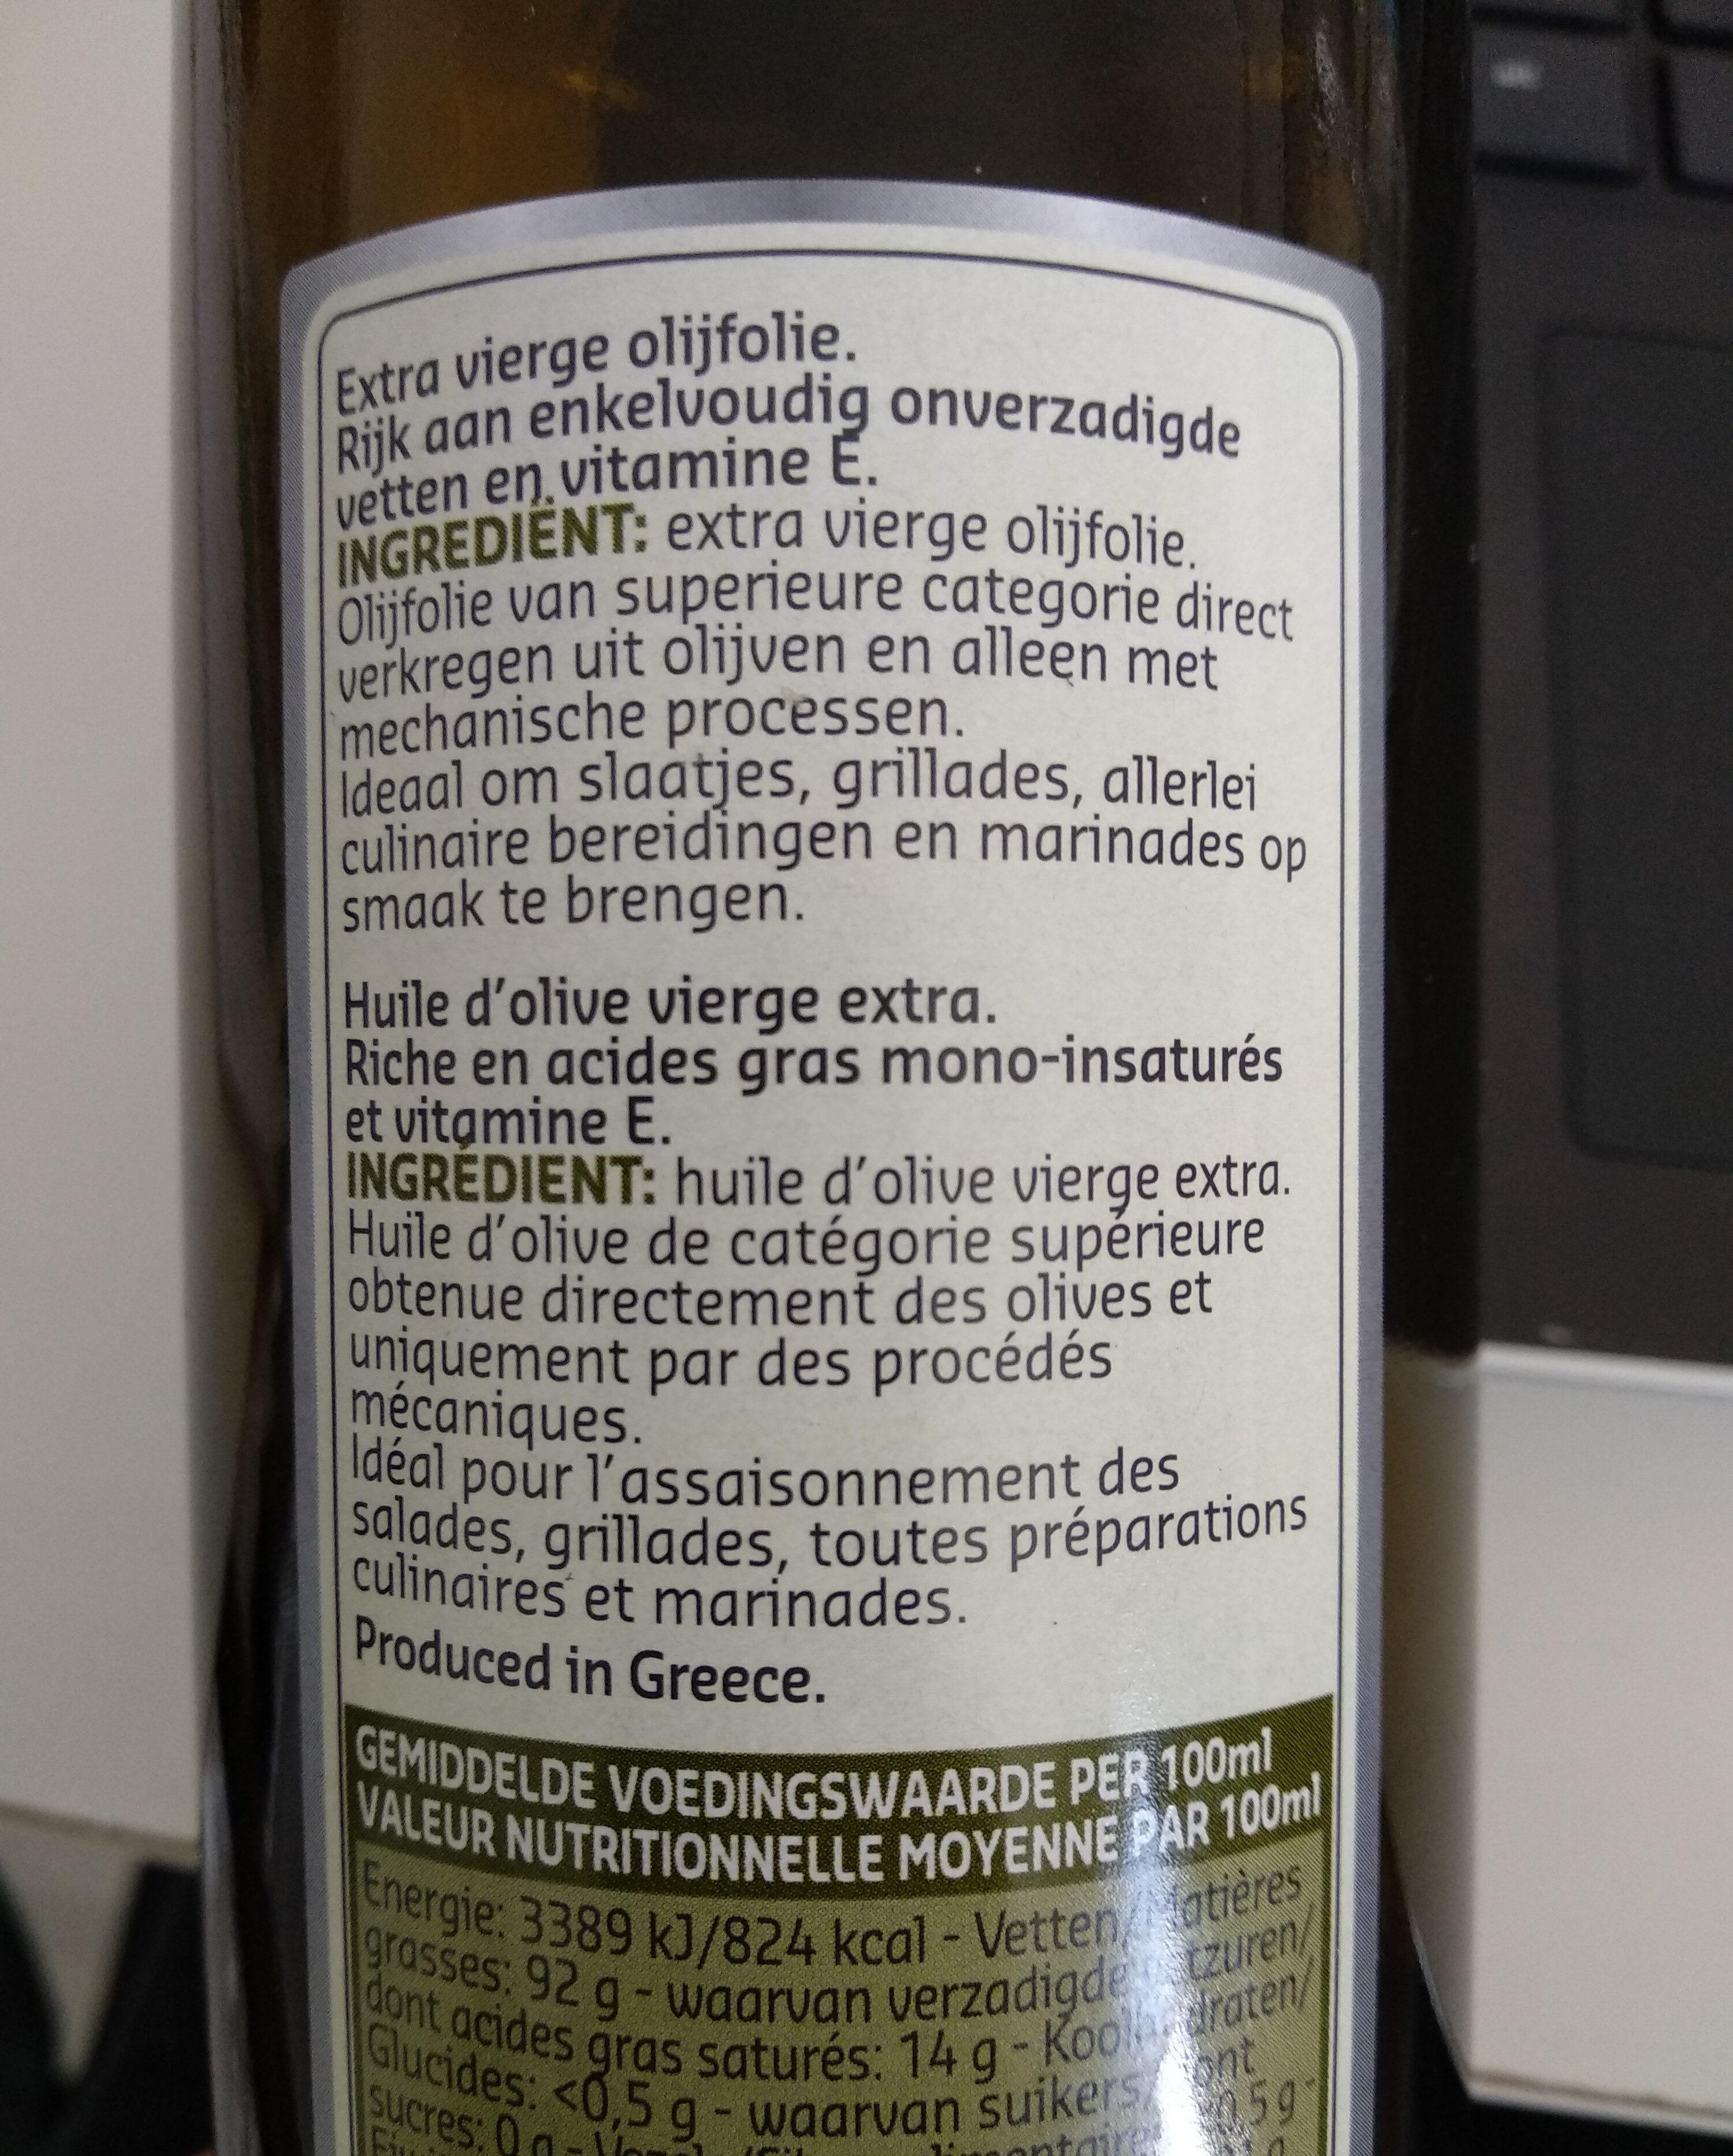 Extra vierge olijfolie - Ingrediënten - nl